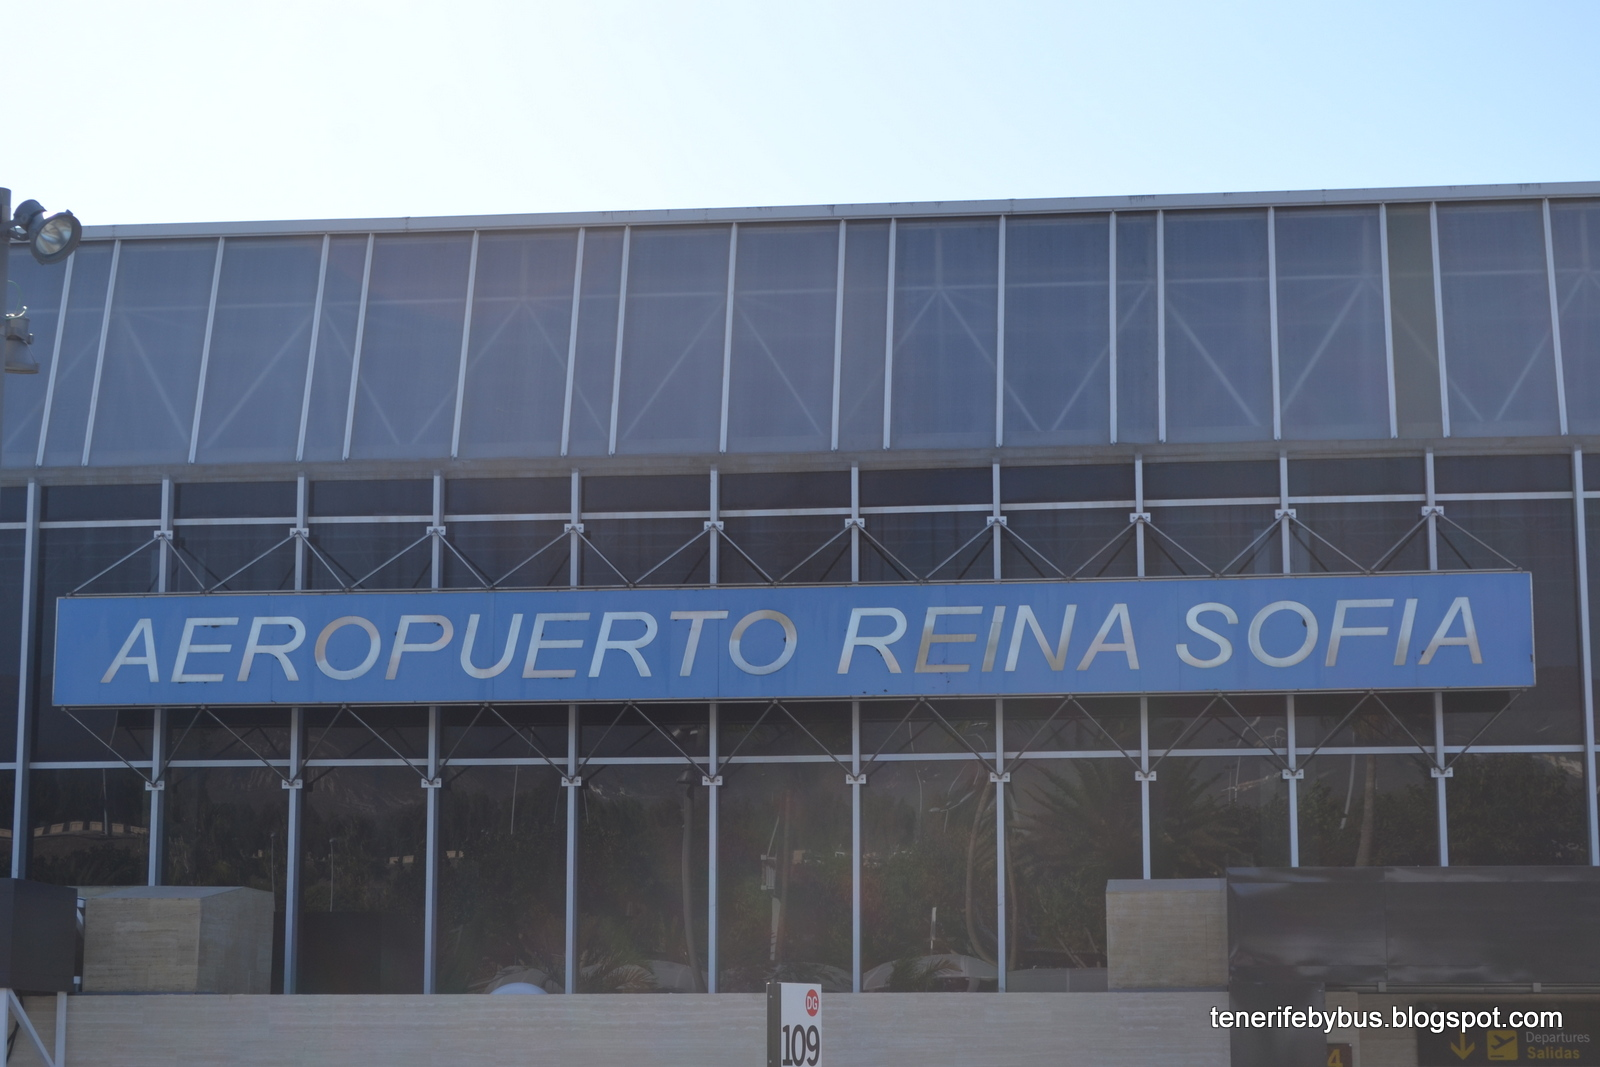 Aeroporto Tenerife Sud : Aeropuerto de tenerife sur or tenerife reina sofia